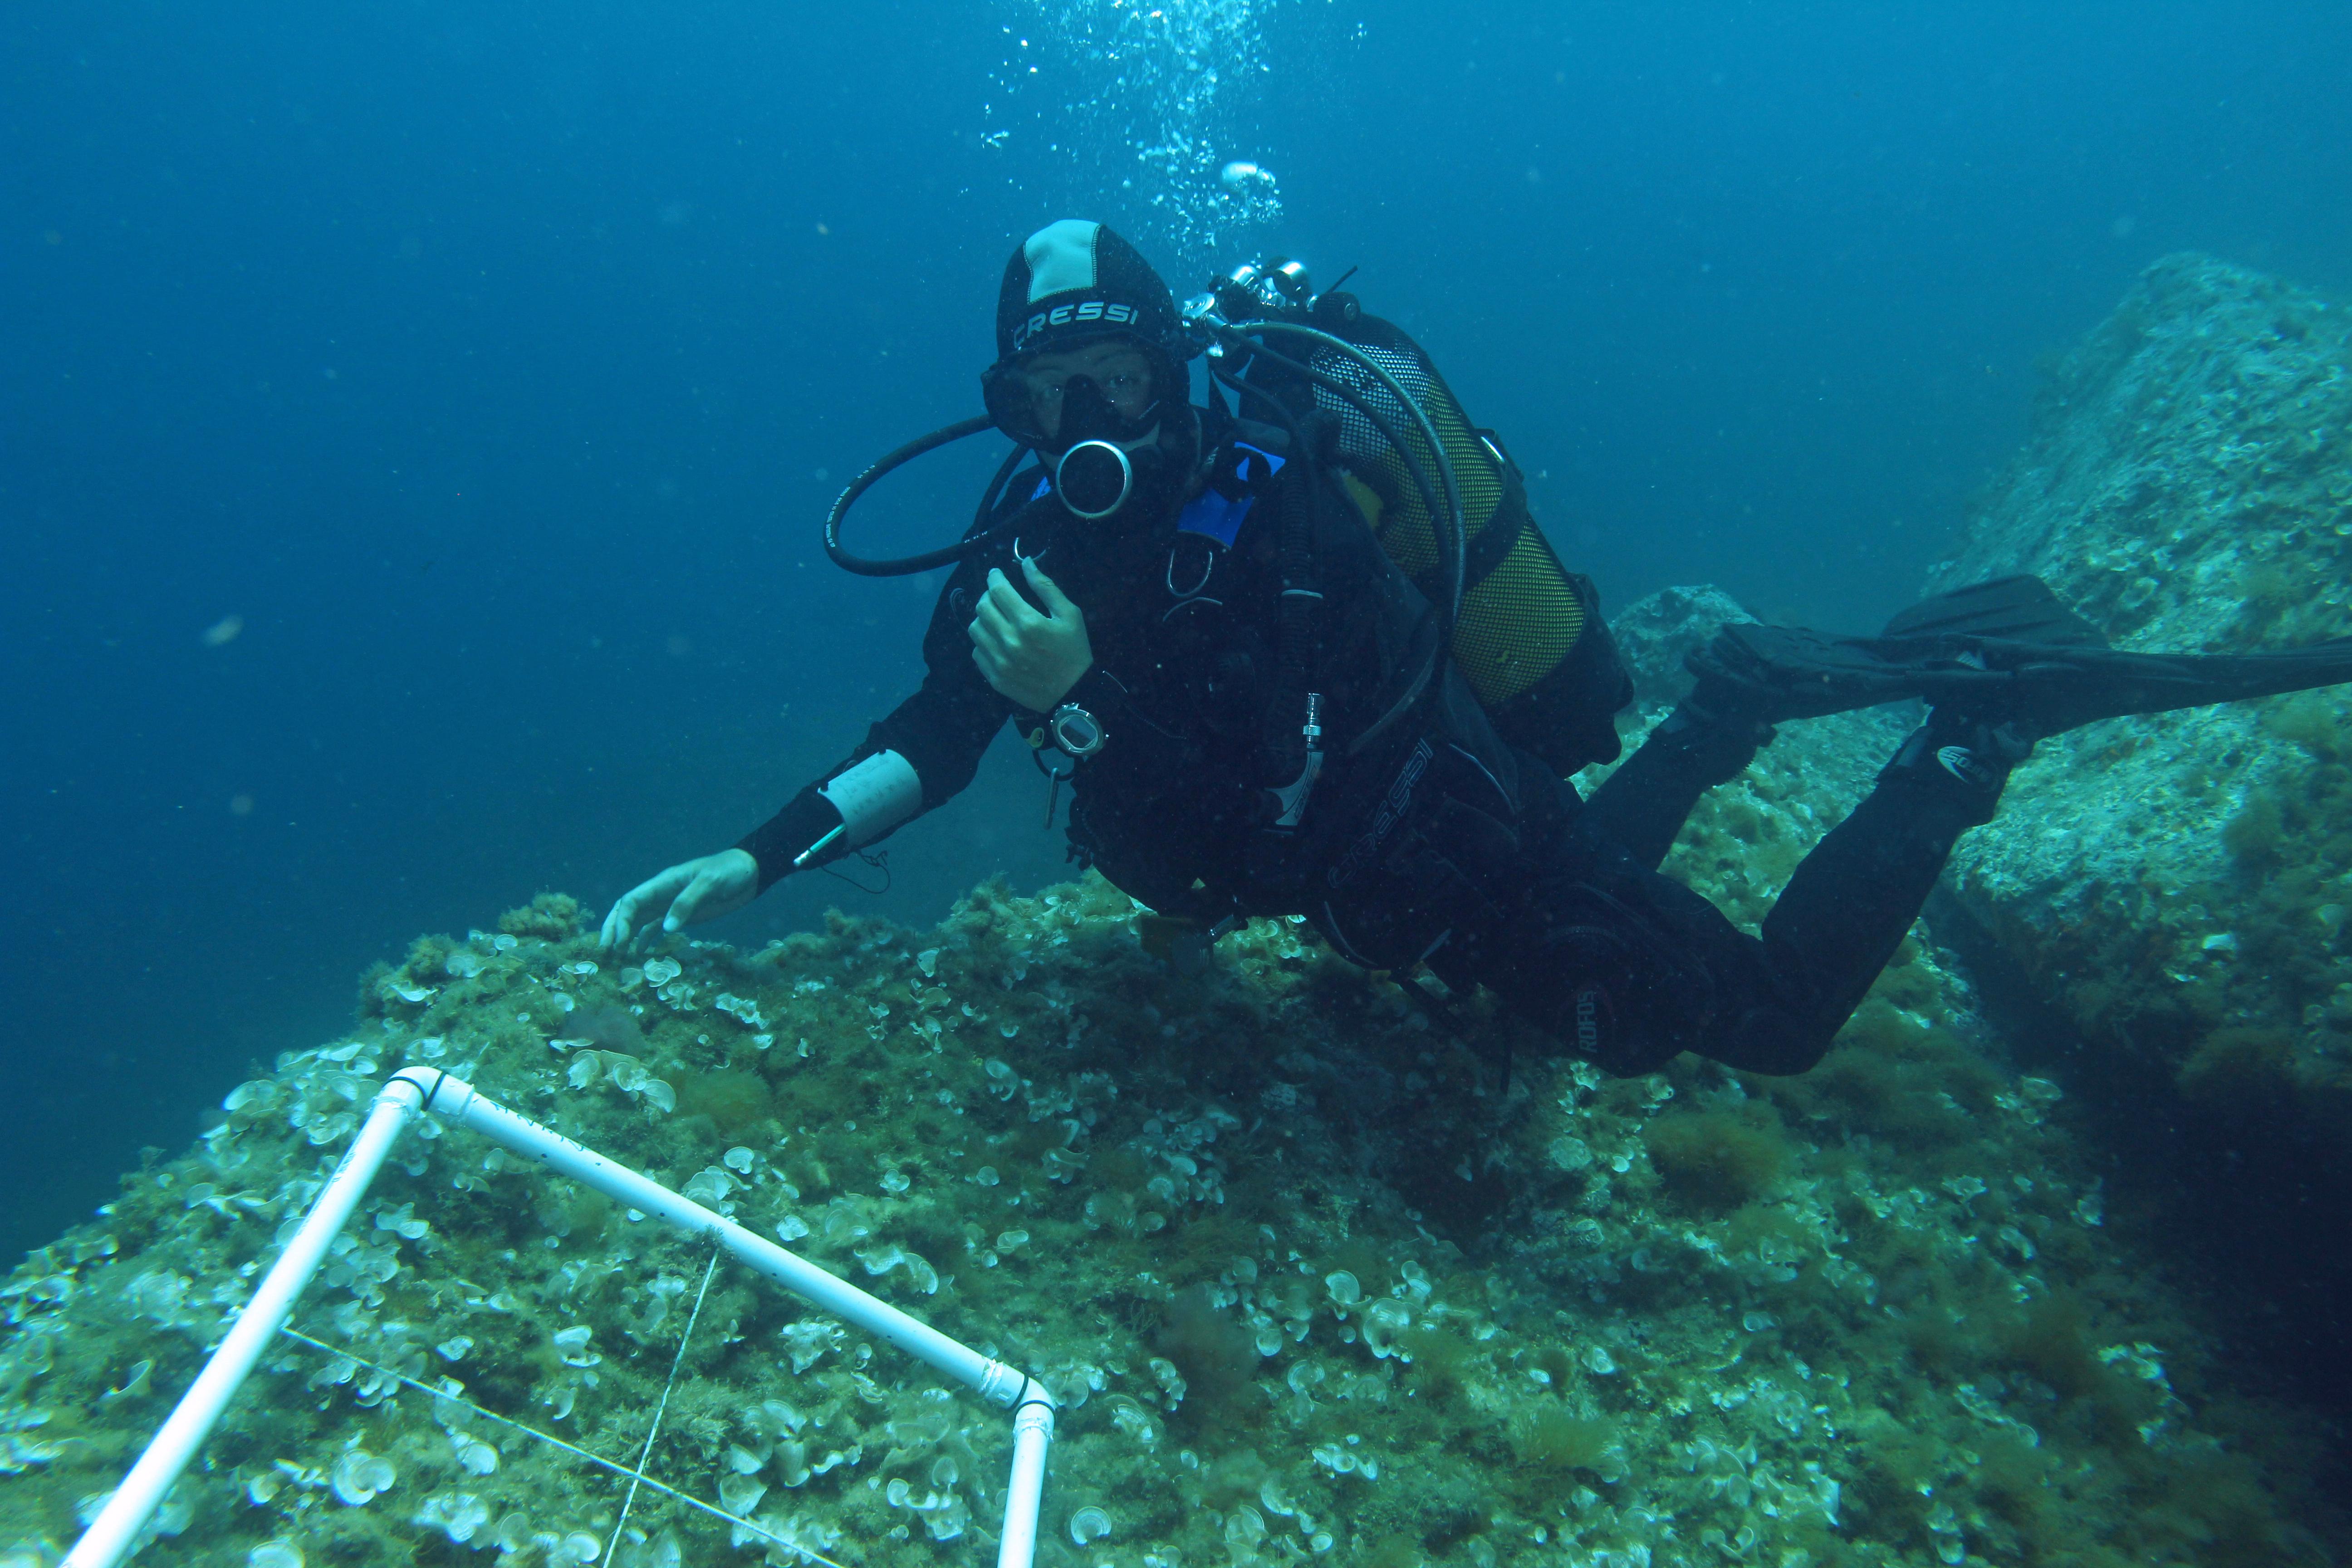 rilevamento sottomarino